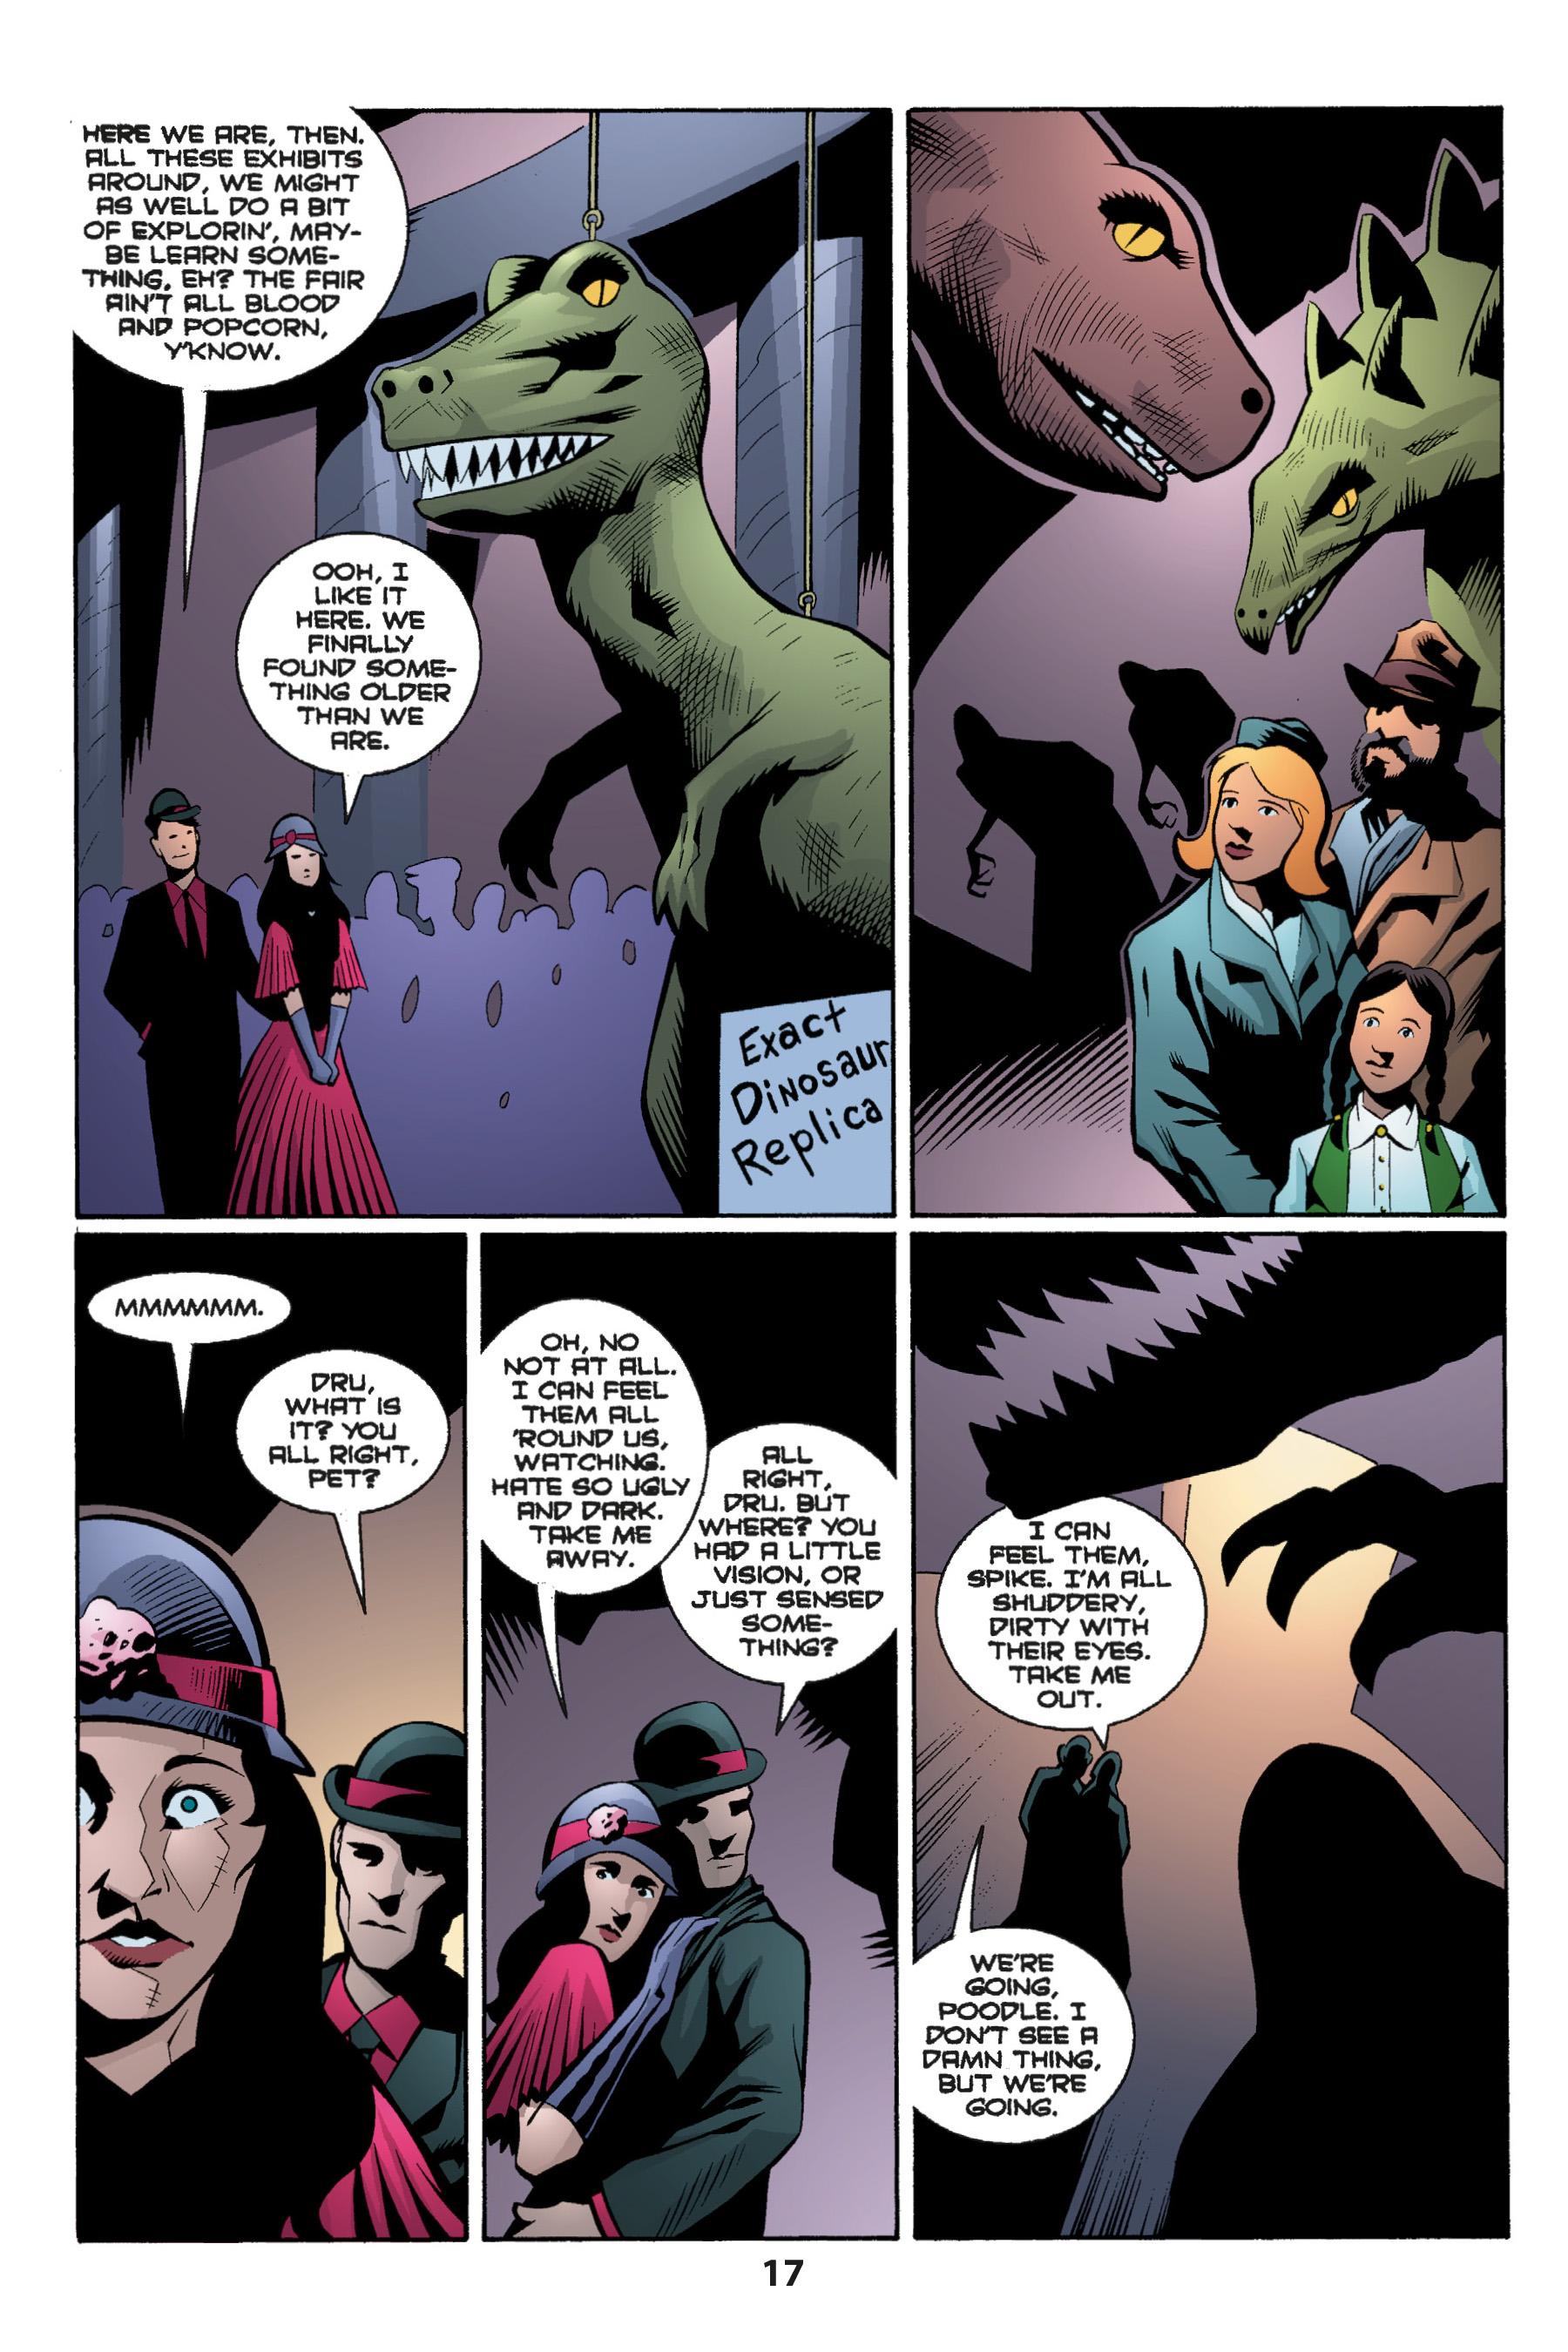 Read online Buffy the Vampire Slayer: Omnibus comic -  Issue # TPB 1 - 19